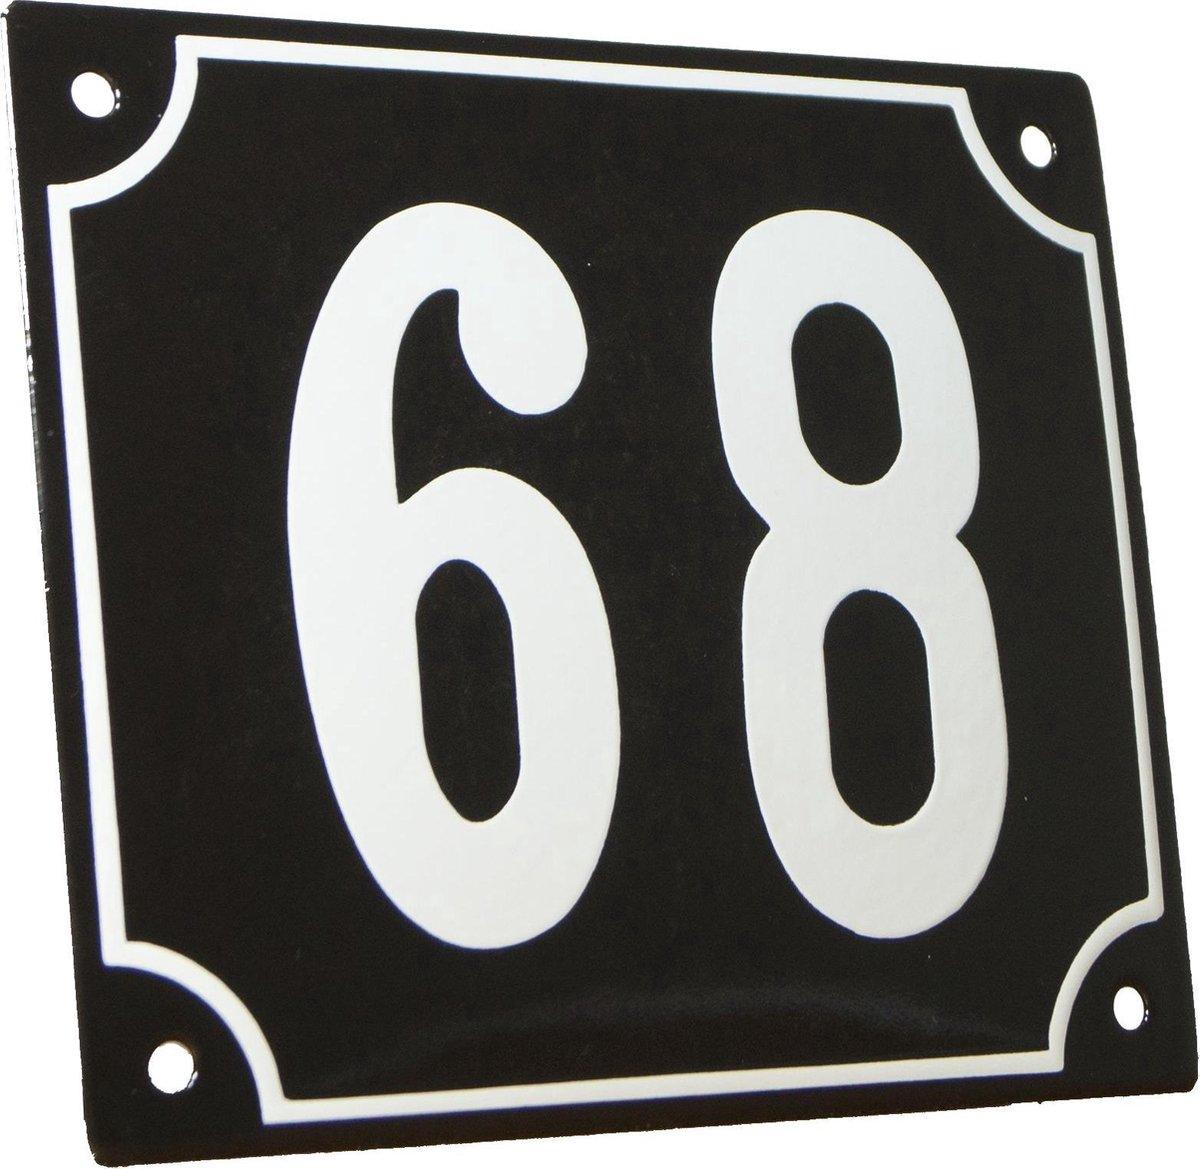 Emaille huisnummer zwart/wit groot nr. 68 18x15cm